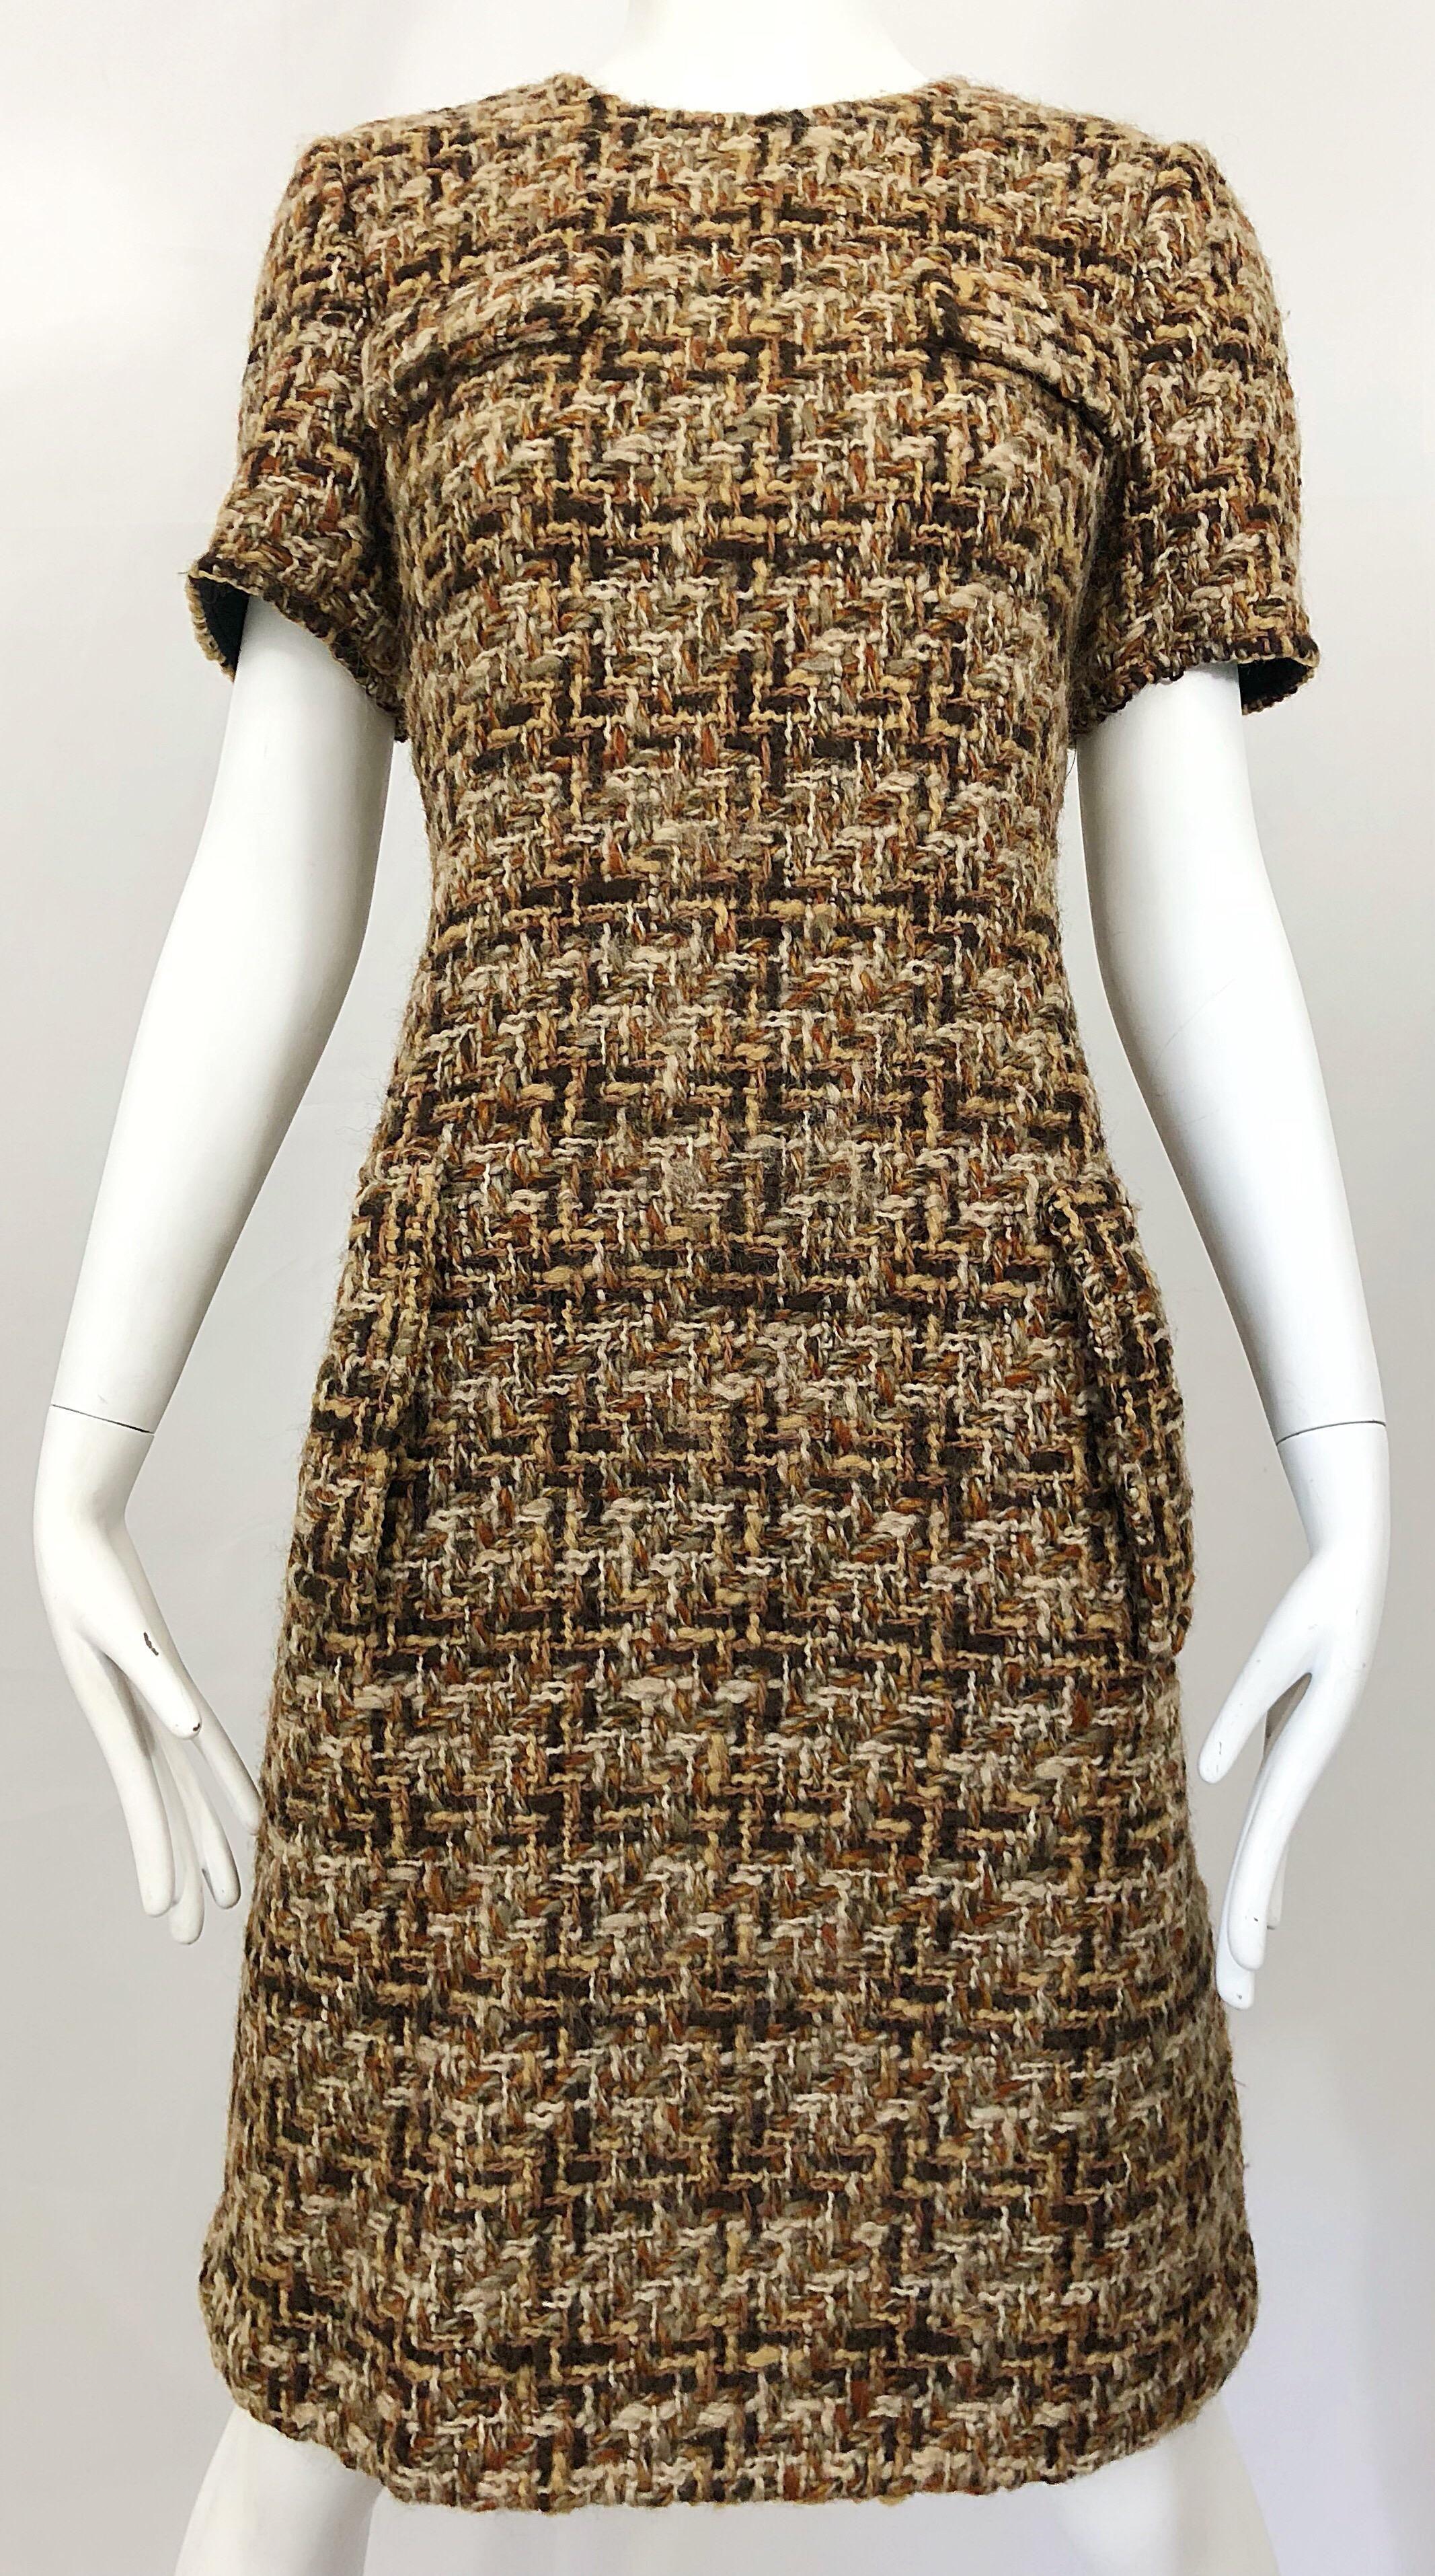 Chic 1960s Brown Taupe Boucle Woven Short Sleeve Vintage 60s Shift Dress Shift Dress Dresses Boucle [ 3830 x 2134 Pixel ]